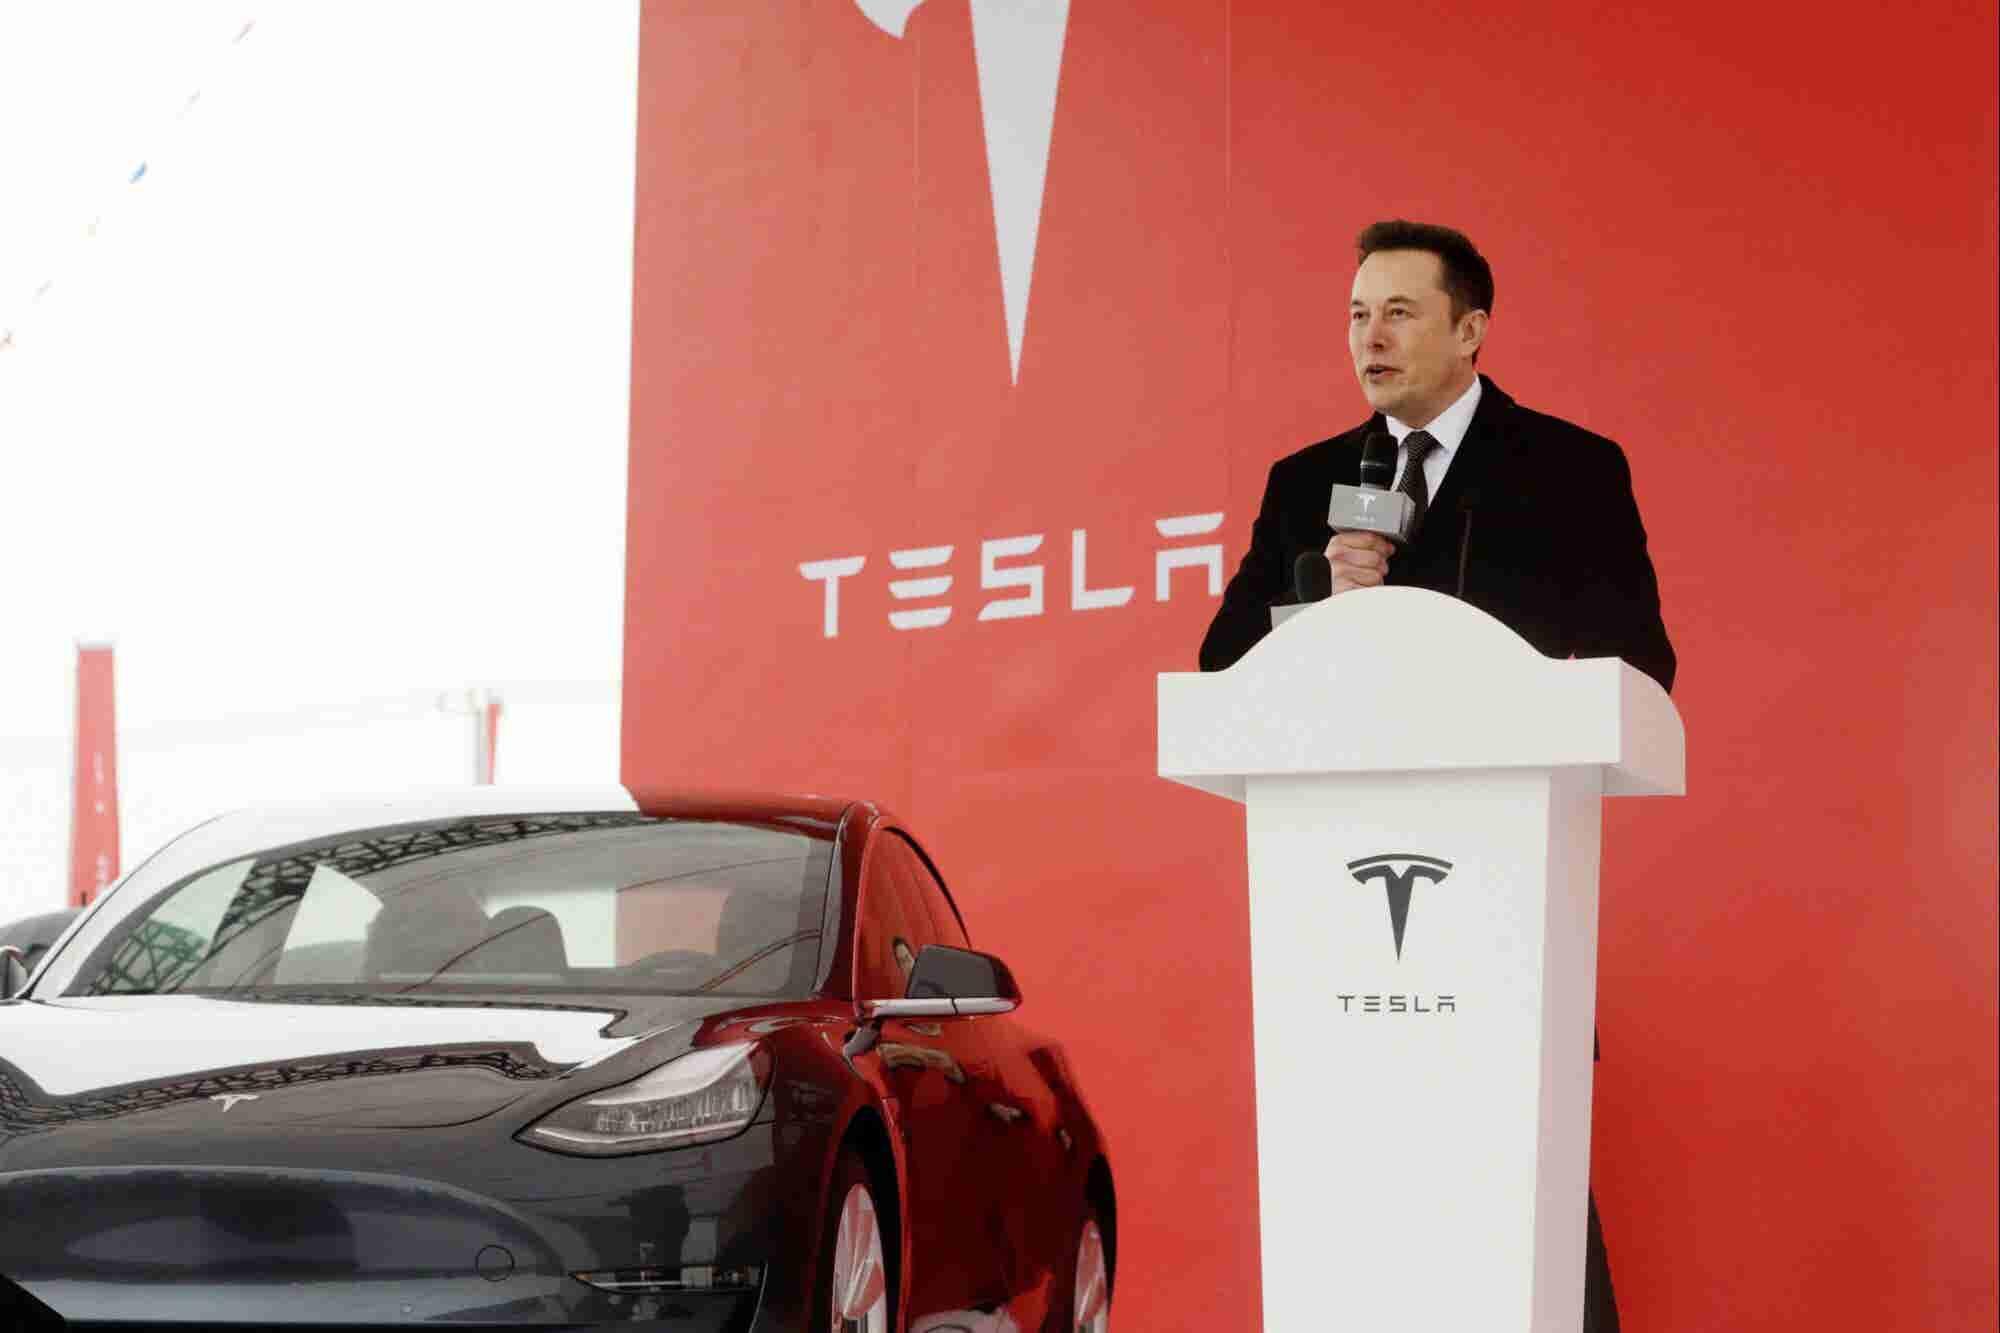 Tesla Shares Continue to Slide After Elon Musk Announces Job Cuts